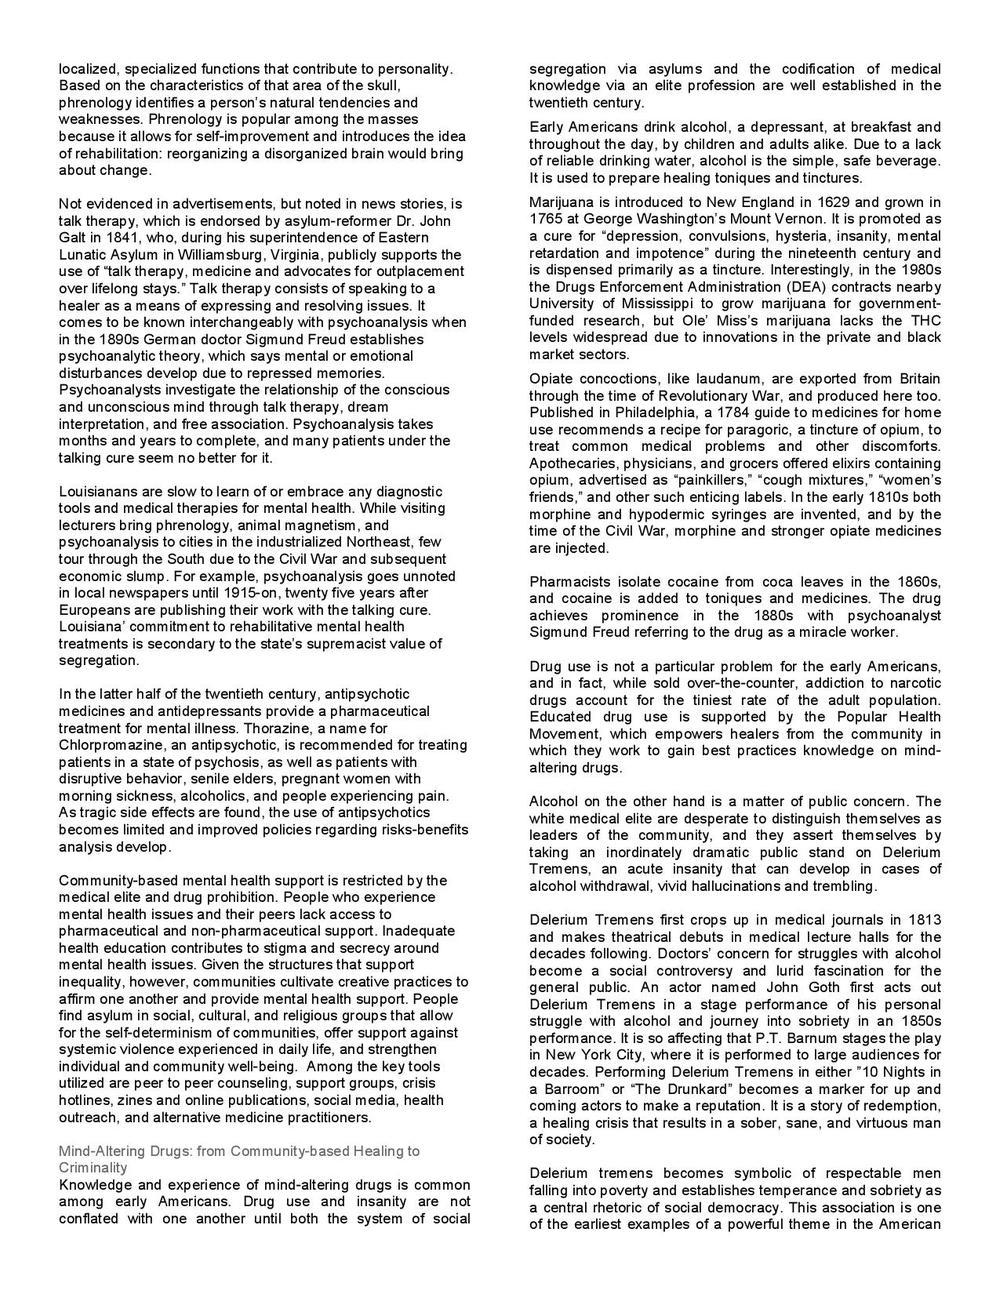 Timeline-page-006.jpg